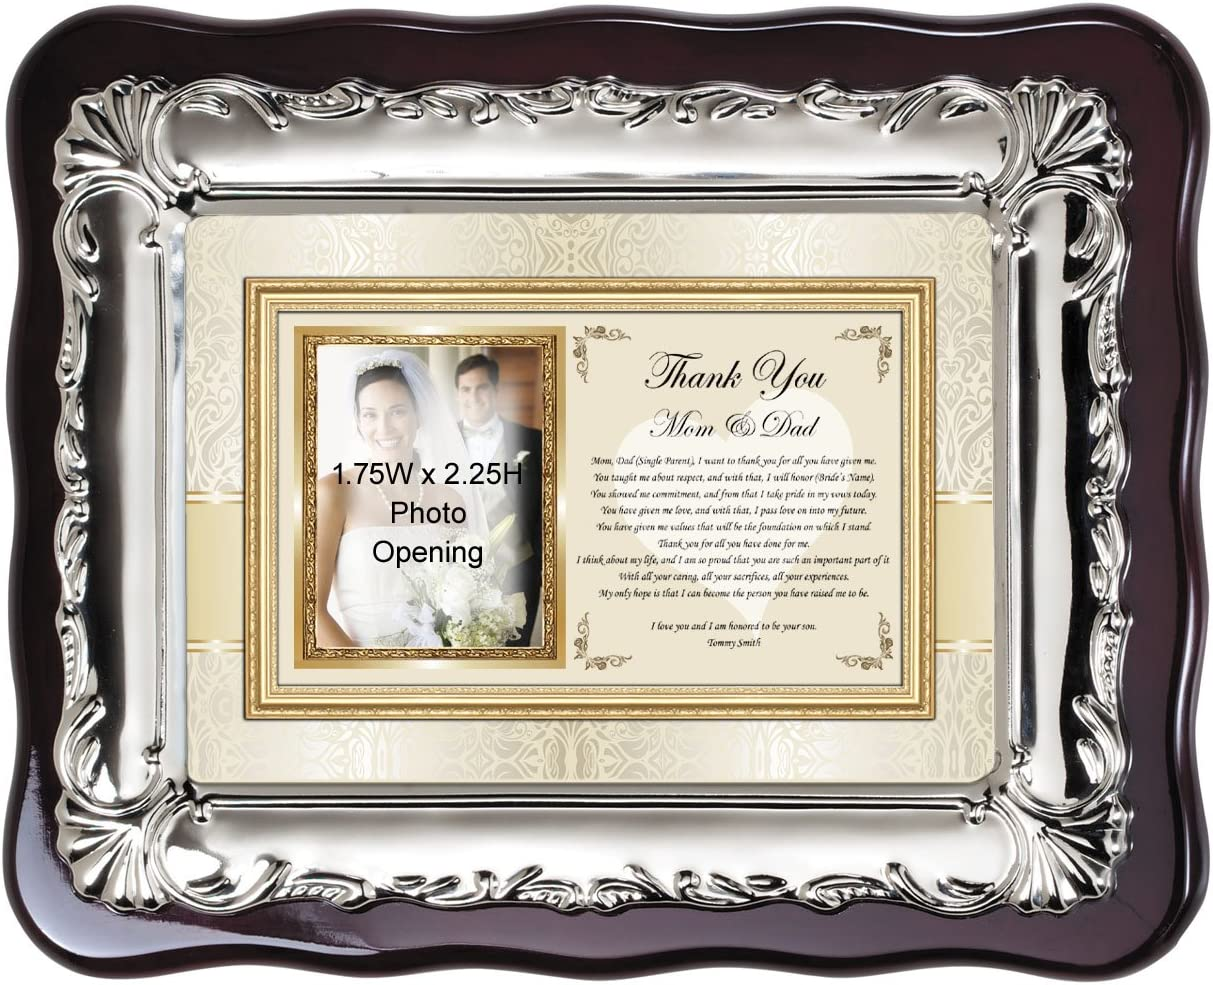 Wedding Gift for Mom Mother of the Bride Handmade Wedding Gifts from PhotoFrameOriginals Custom Photo Mats